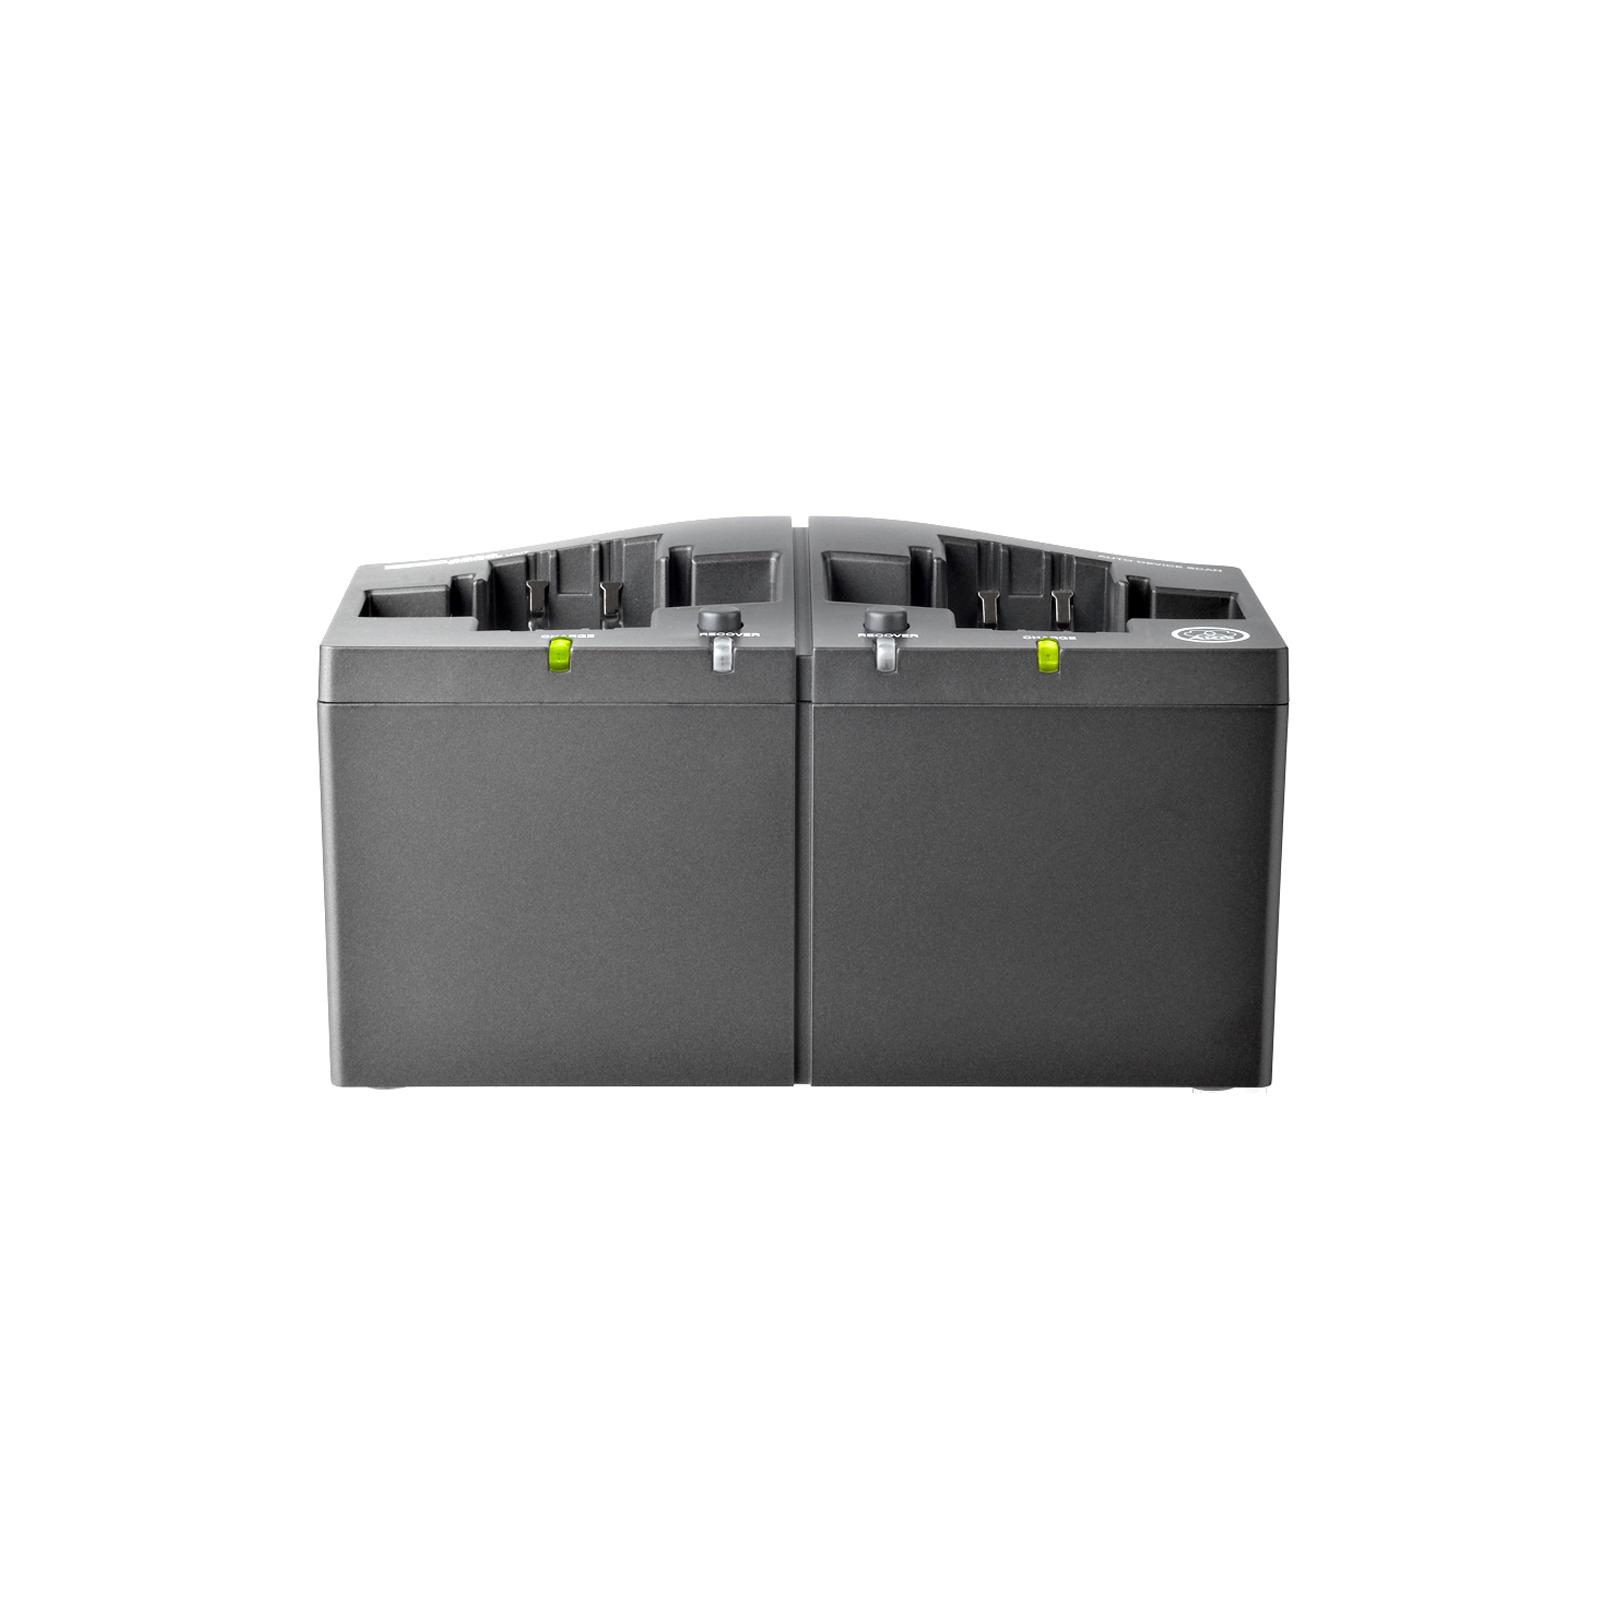 CU4000 - Black - Charging unit for HT4500 and PT4500 transmitters and SPR4500 IEM receiver - Detailshot 1